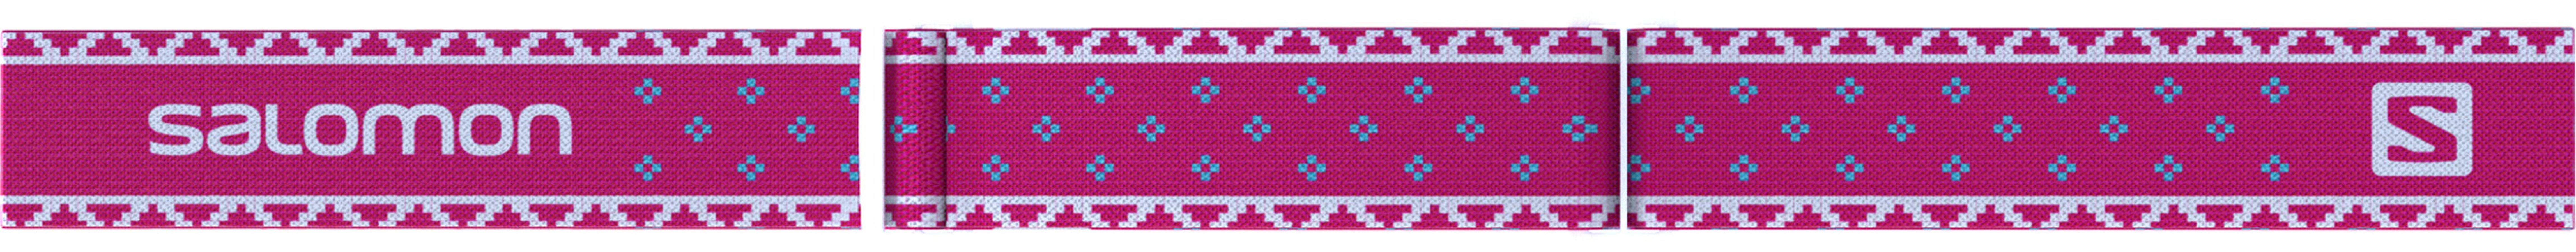 Salomon Kiwi Access goggles Kinderen roze wit l Outdoor winkel campz.be 6d09167c9adf4